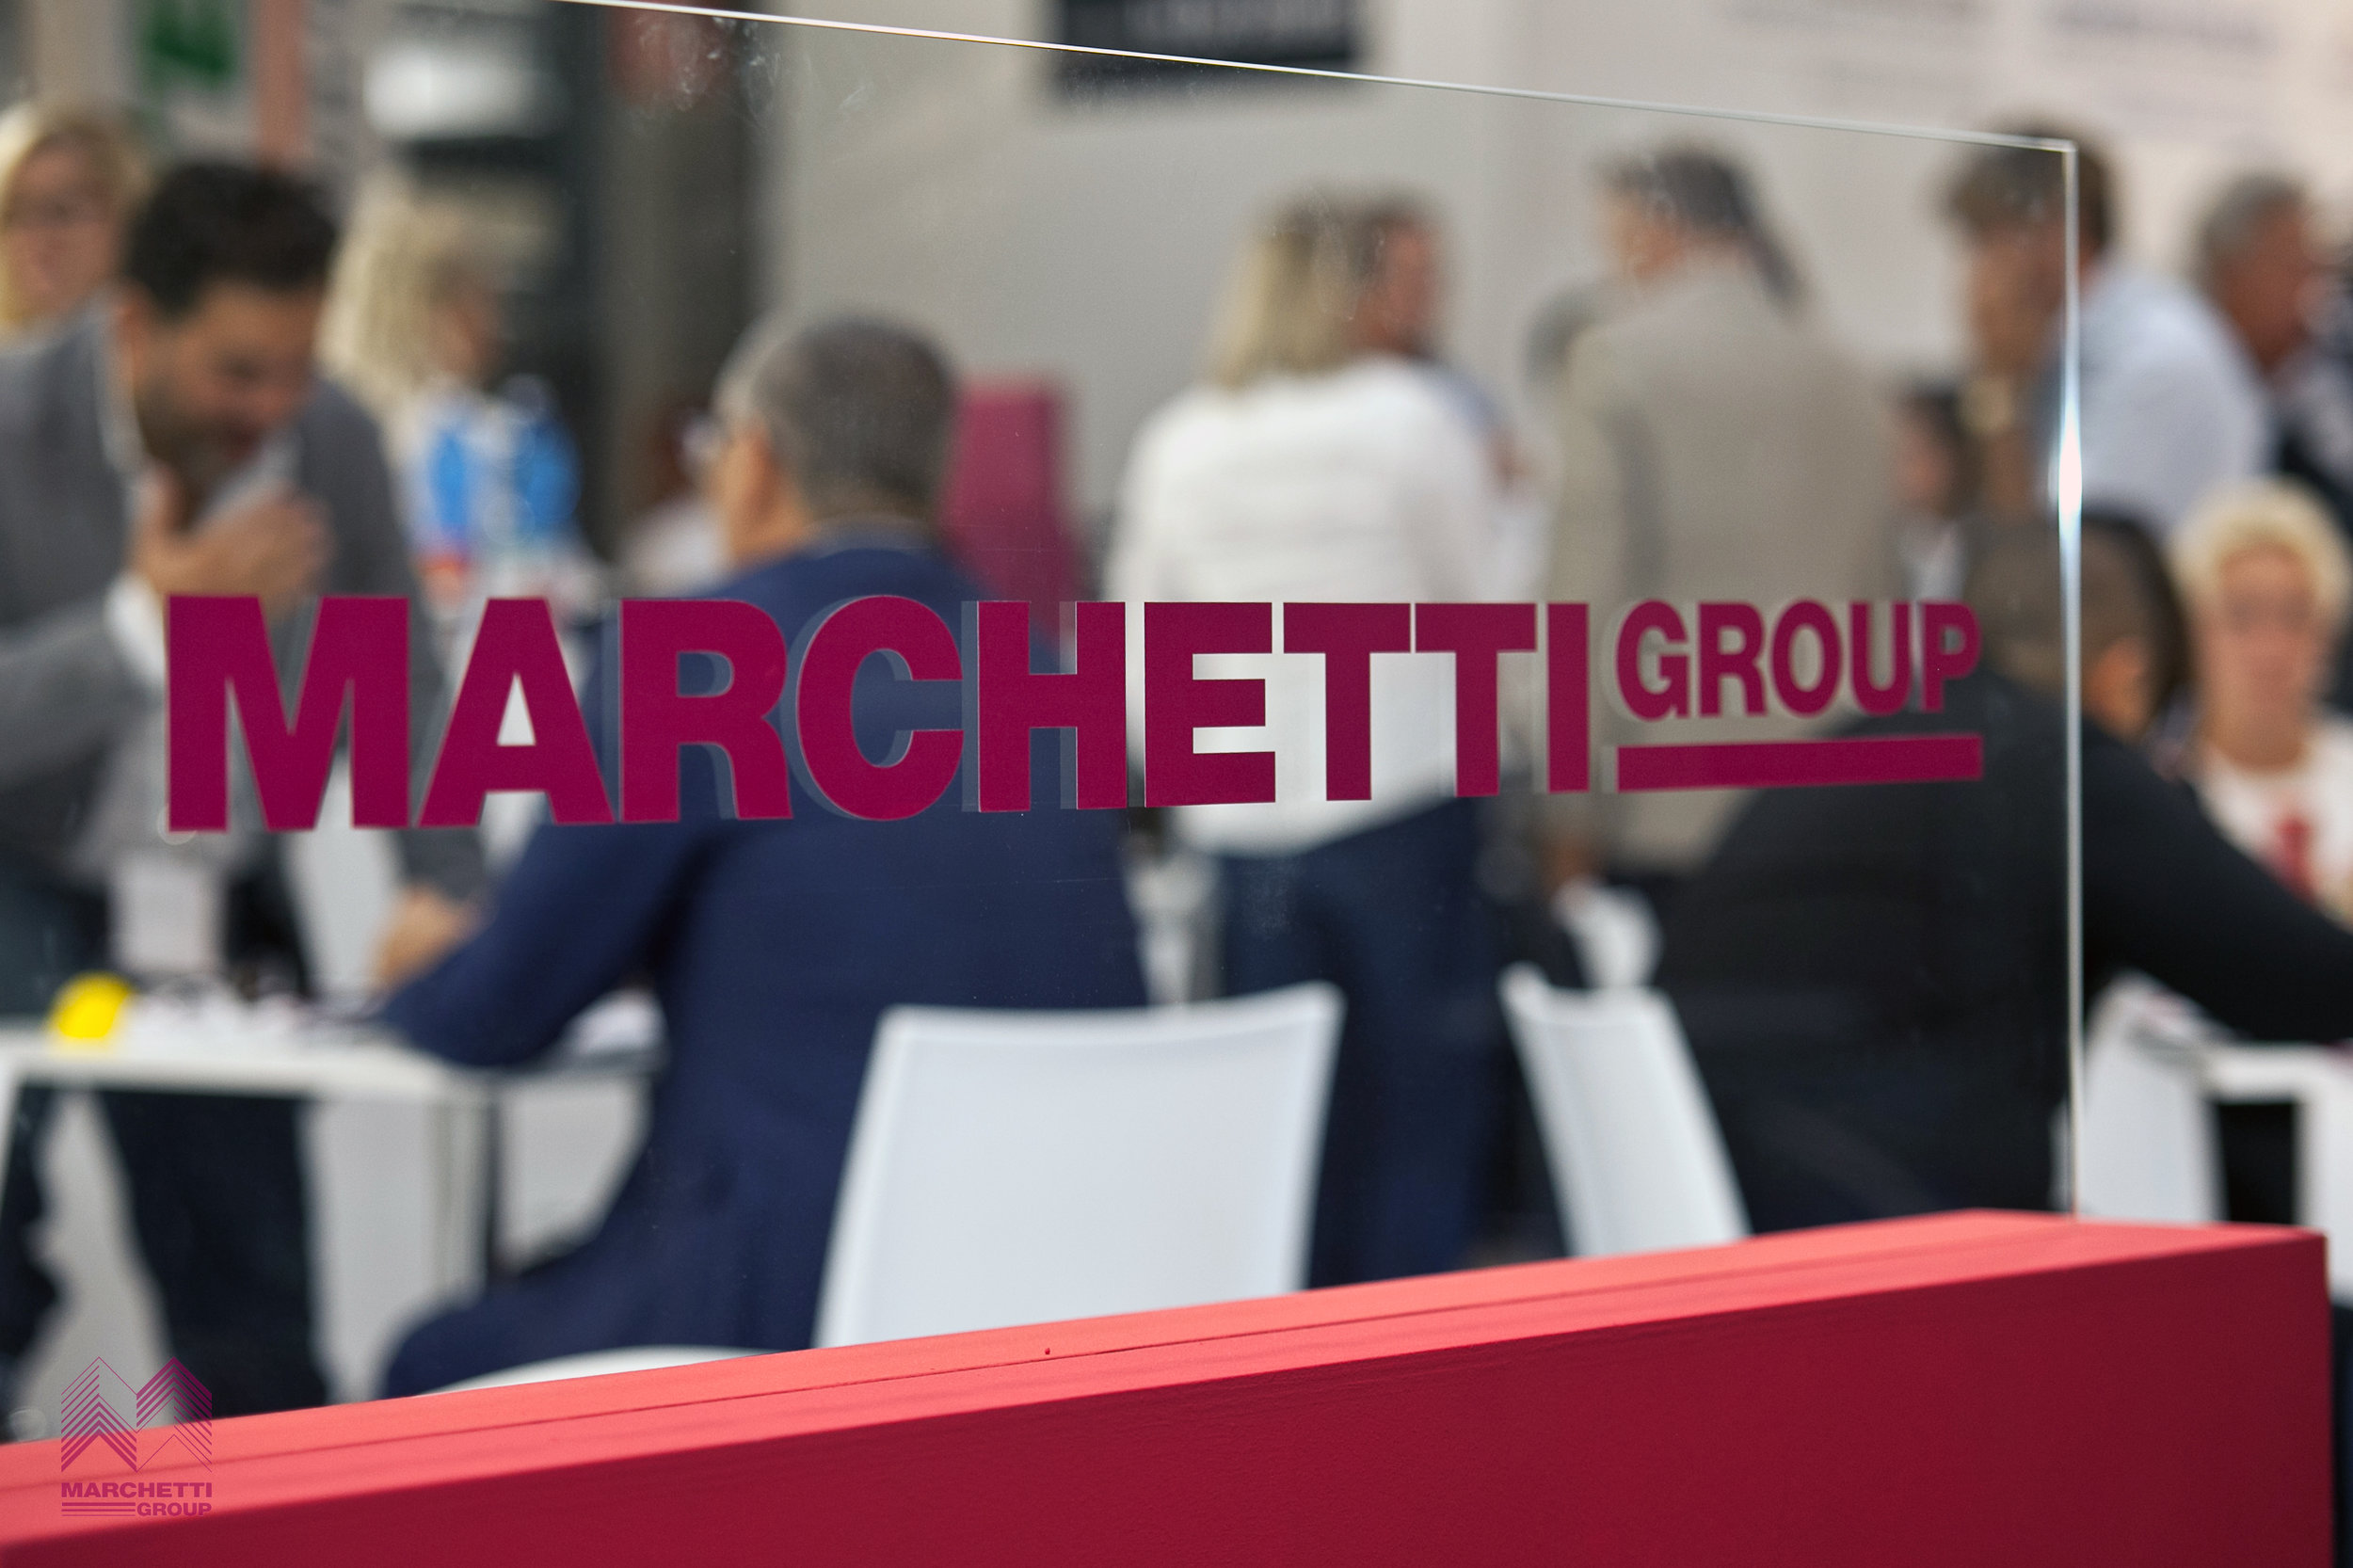 marchetti group glass.jpg